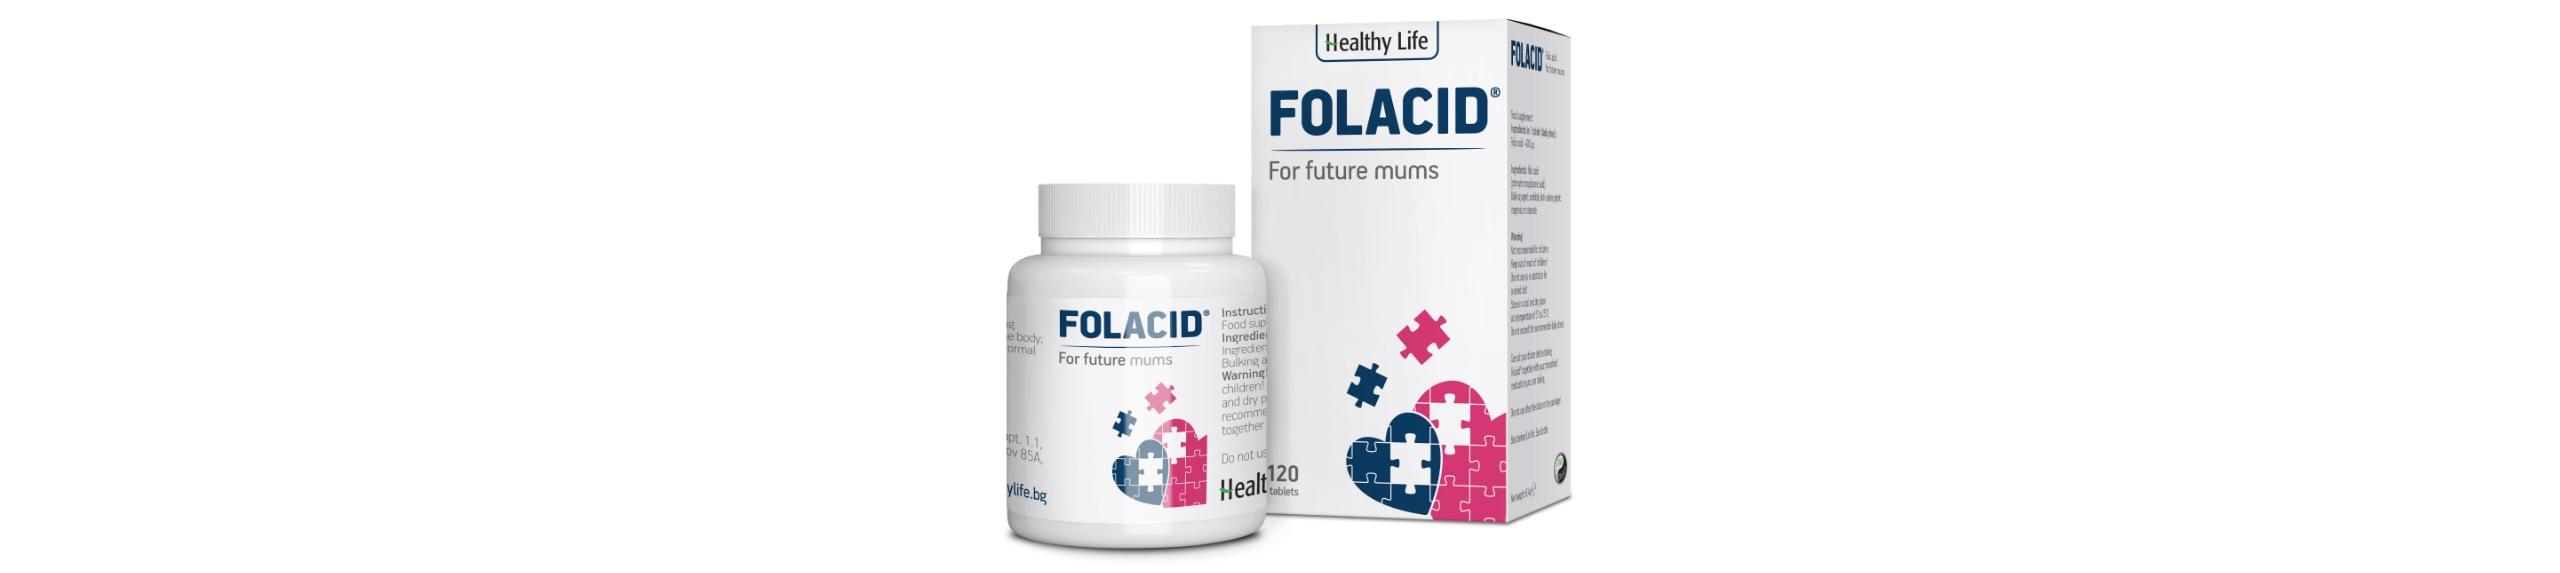 P3-Slider-img-FolacidM1